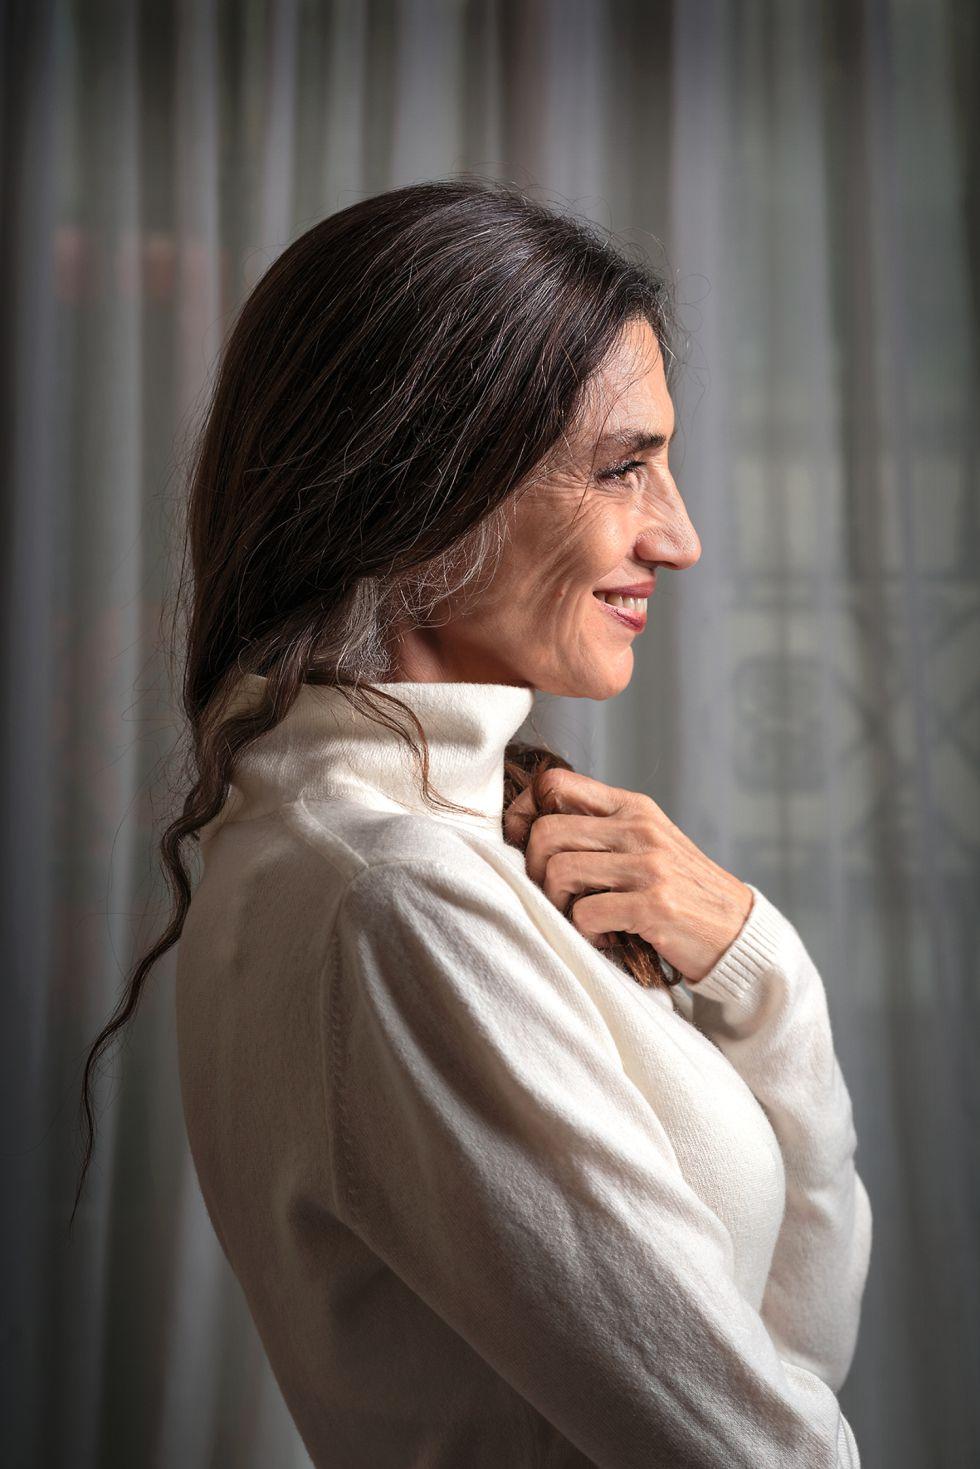 Angela Molina Sexy angela molina (spanish actress, 59 years old) even more